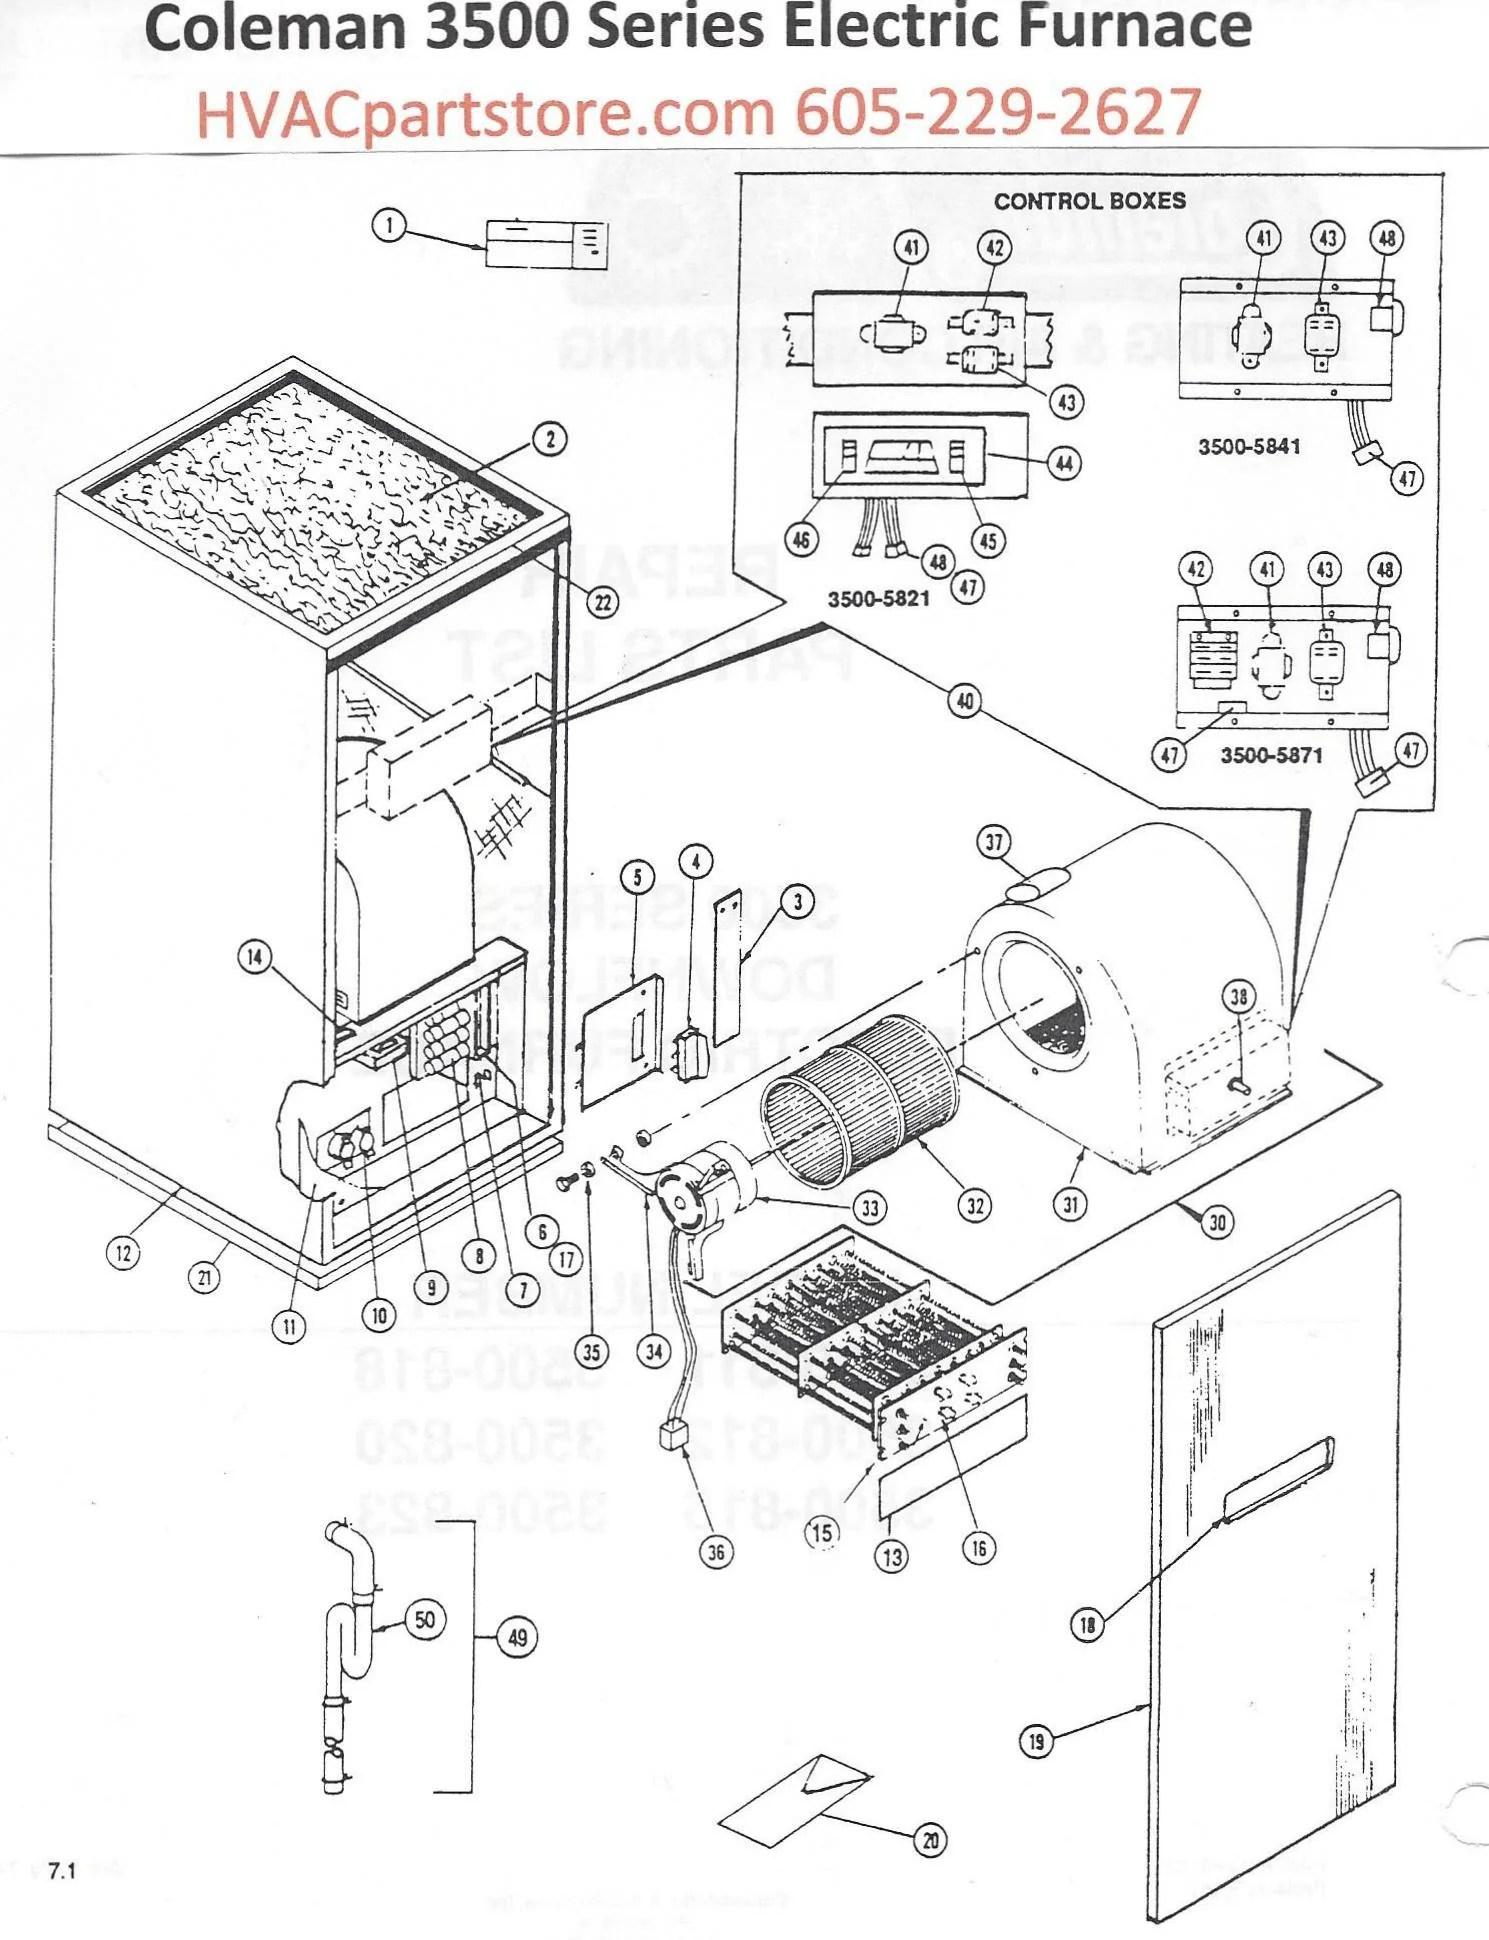 3500811 Coleman Electric Furnace Parts – HVACpartstore